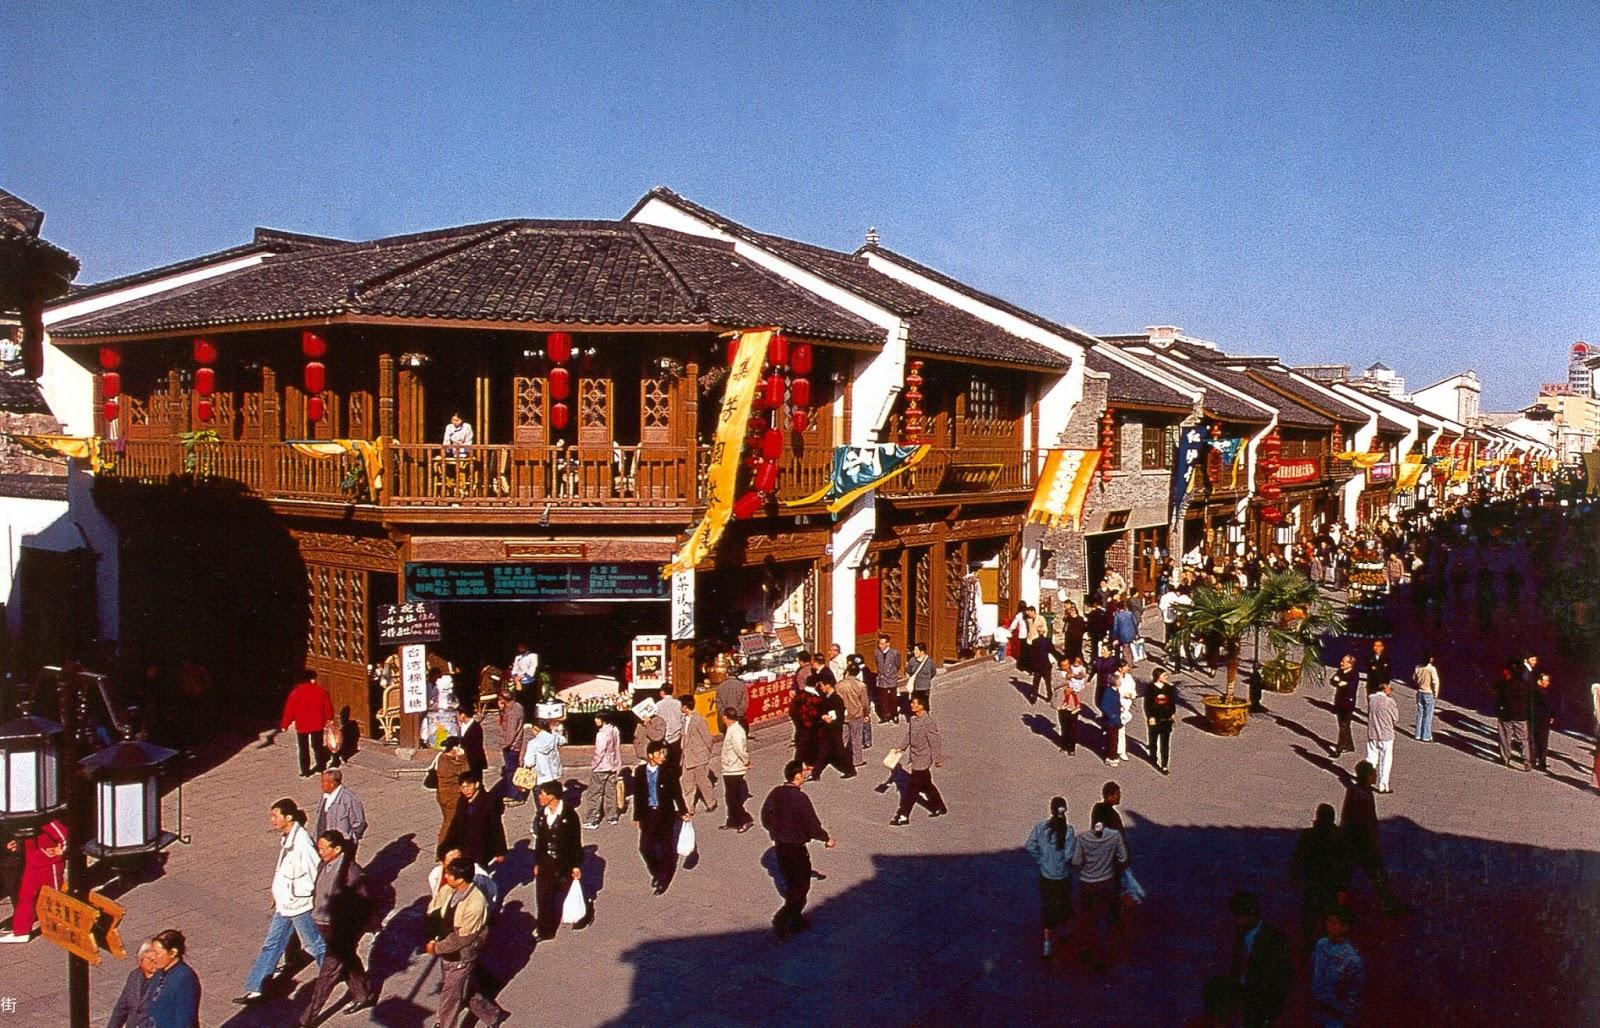 Qinghefang